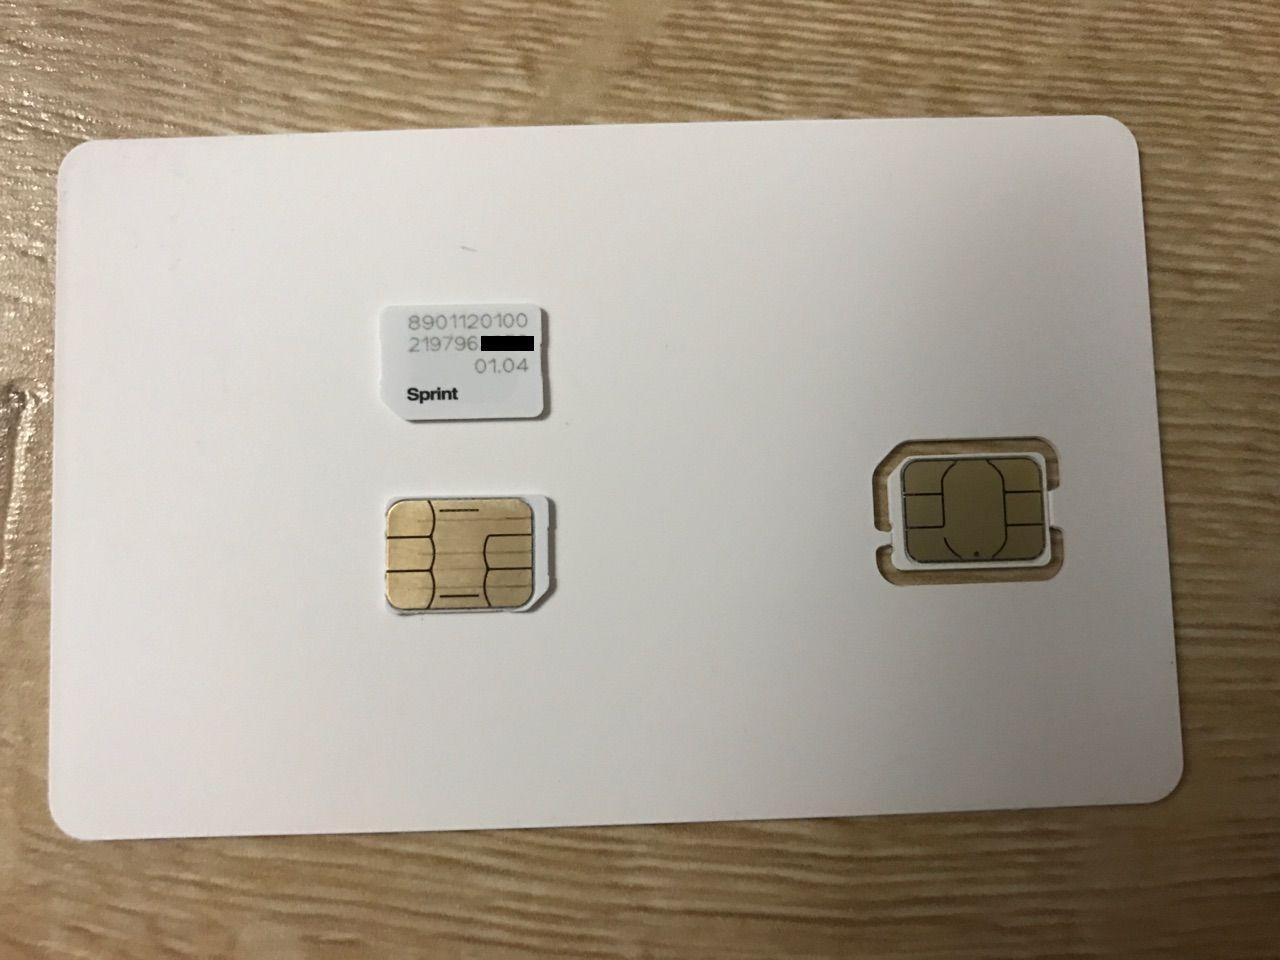 TELLO Sprint Boost Virgin Mobile Nano Sim Card Part SIMGLW43